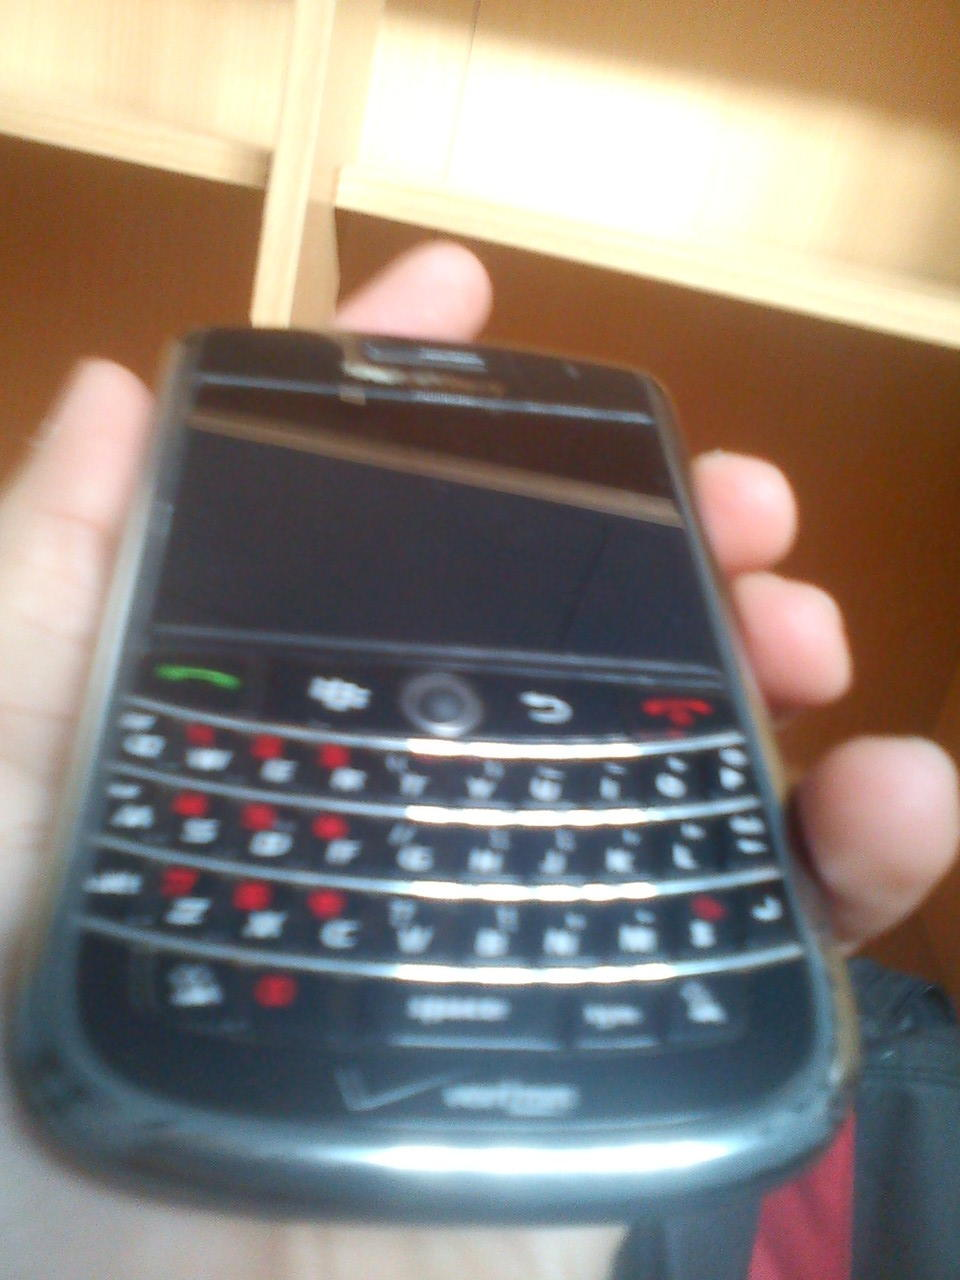 blackberry bb tour 9630 verizon